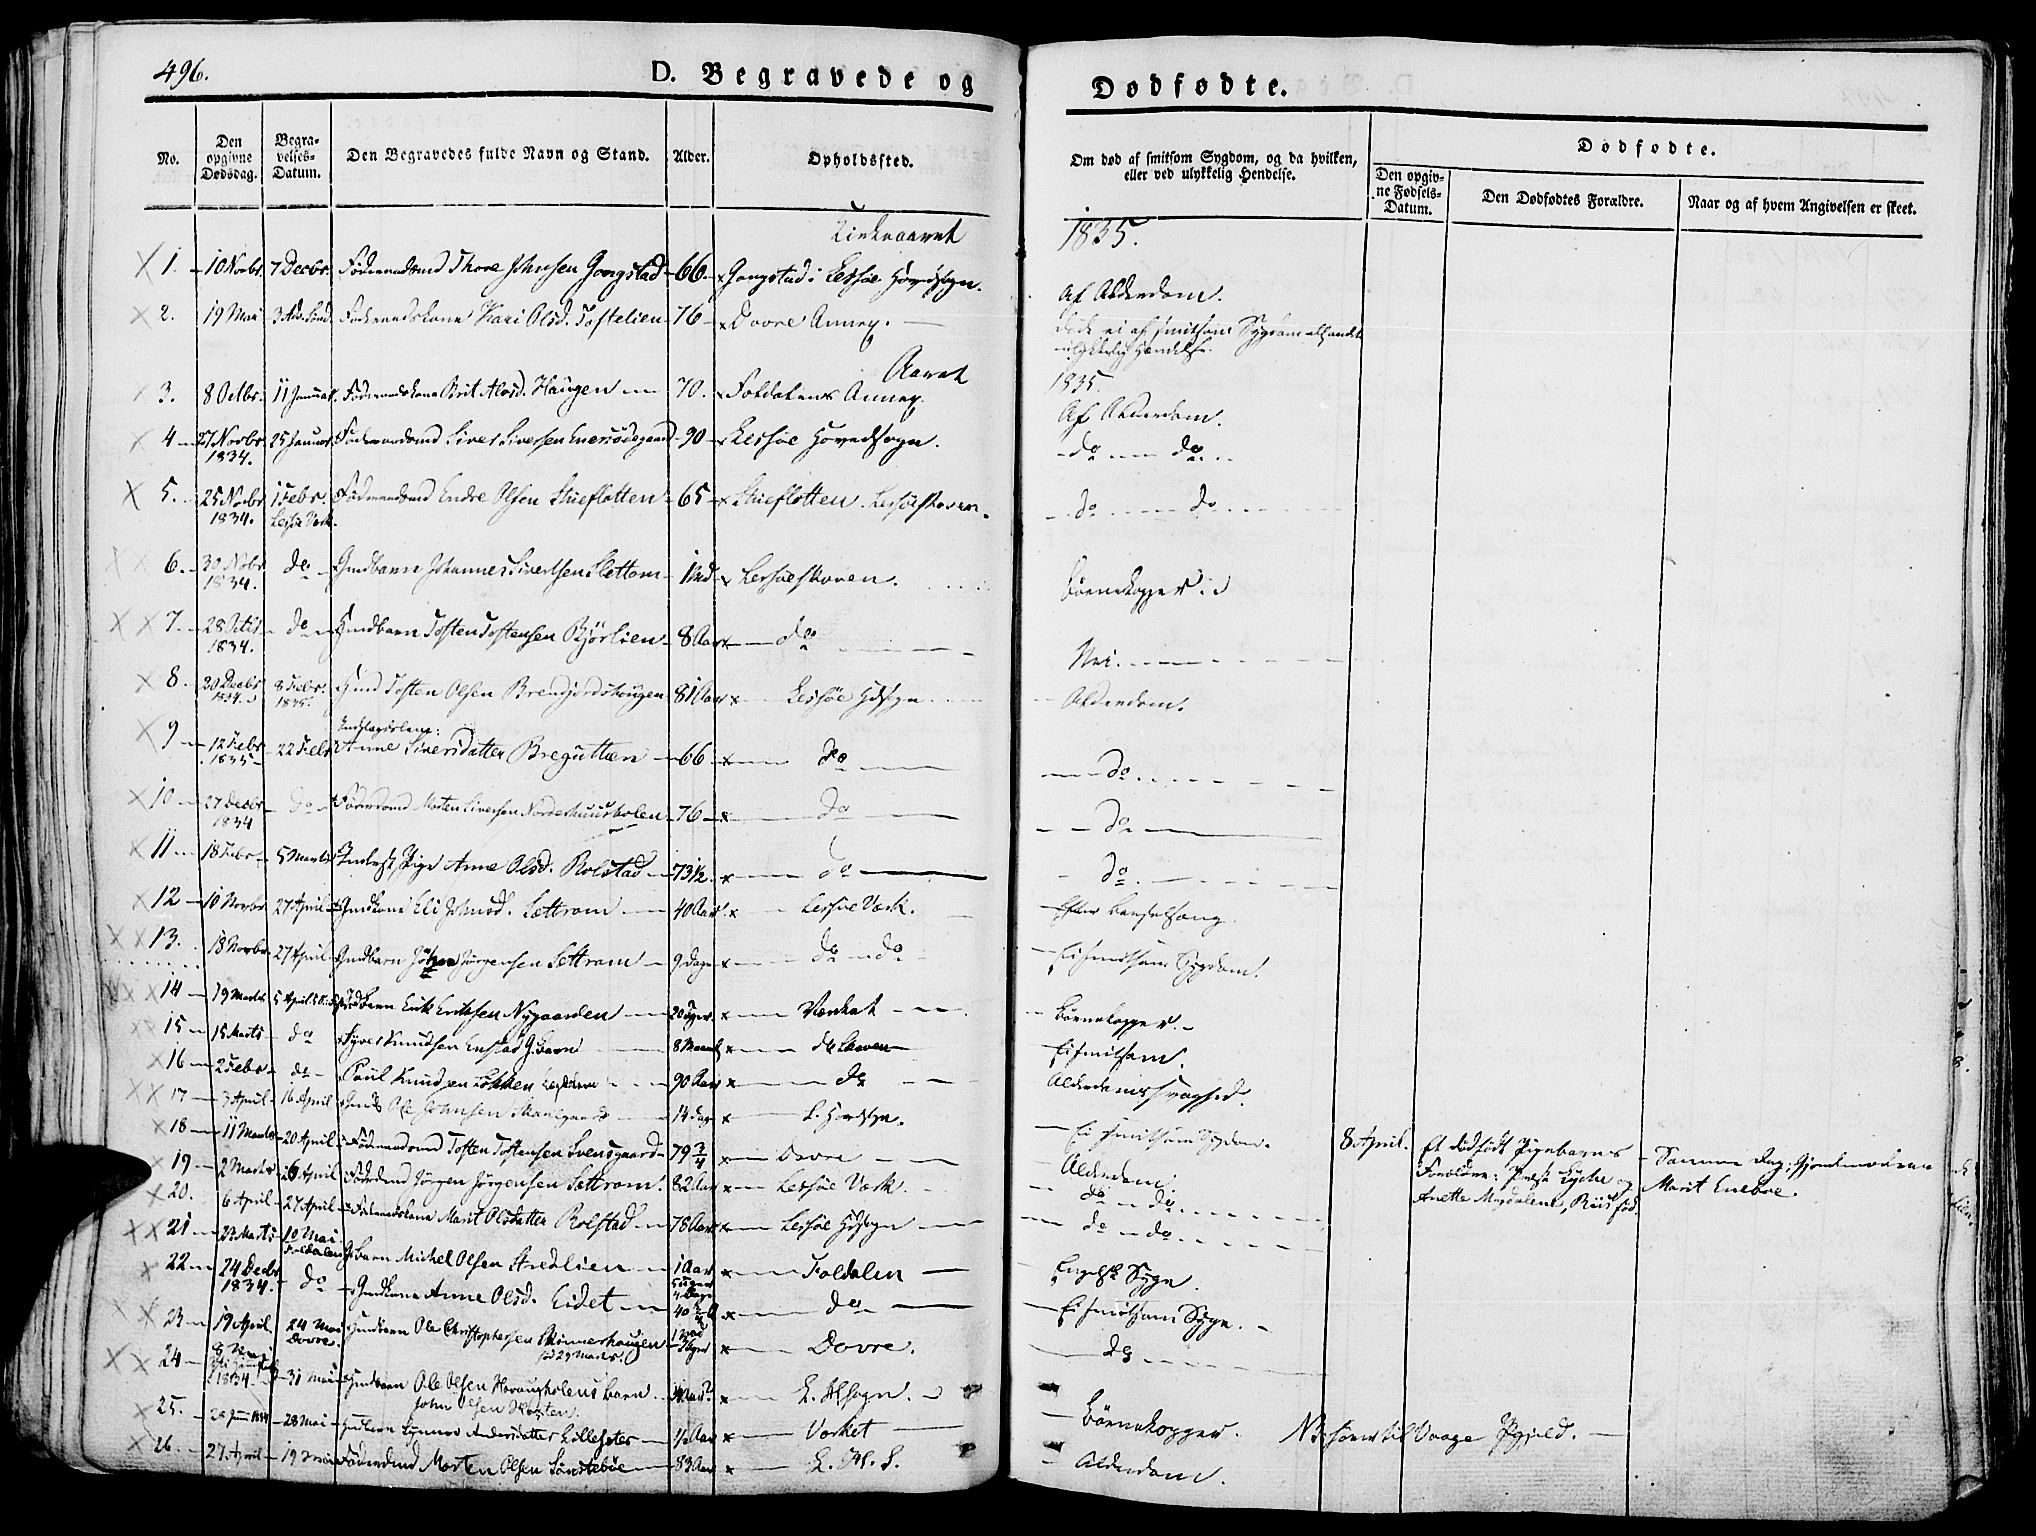 SAH, Lesja prestekontor, Ministerialbok nr. 5, 1830-1842, s. 496